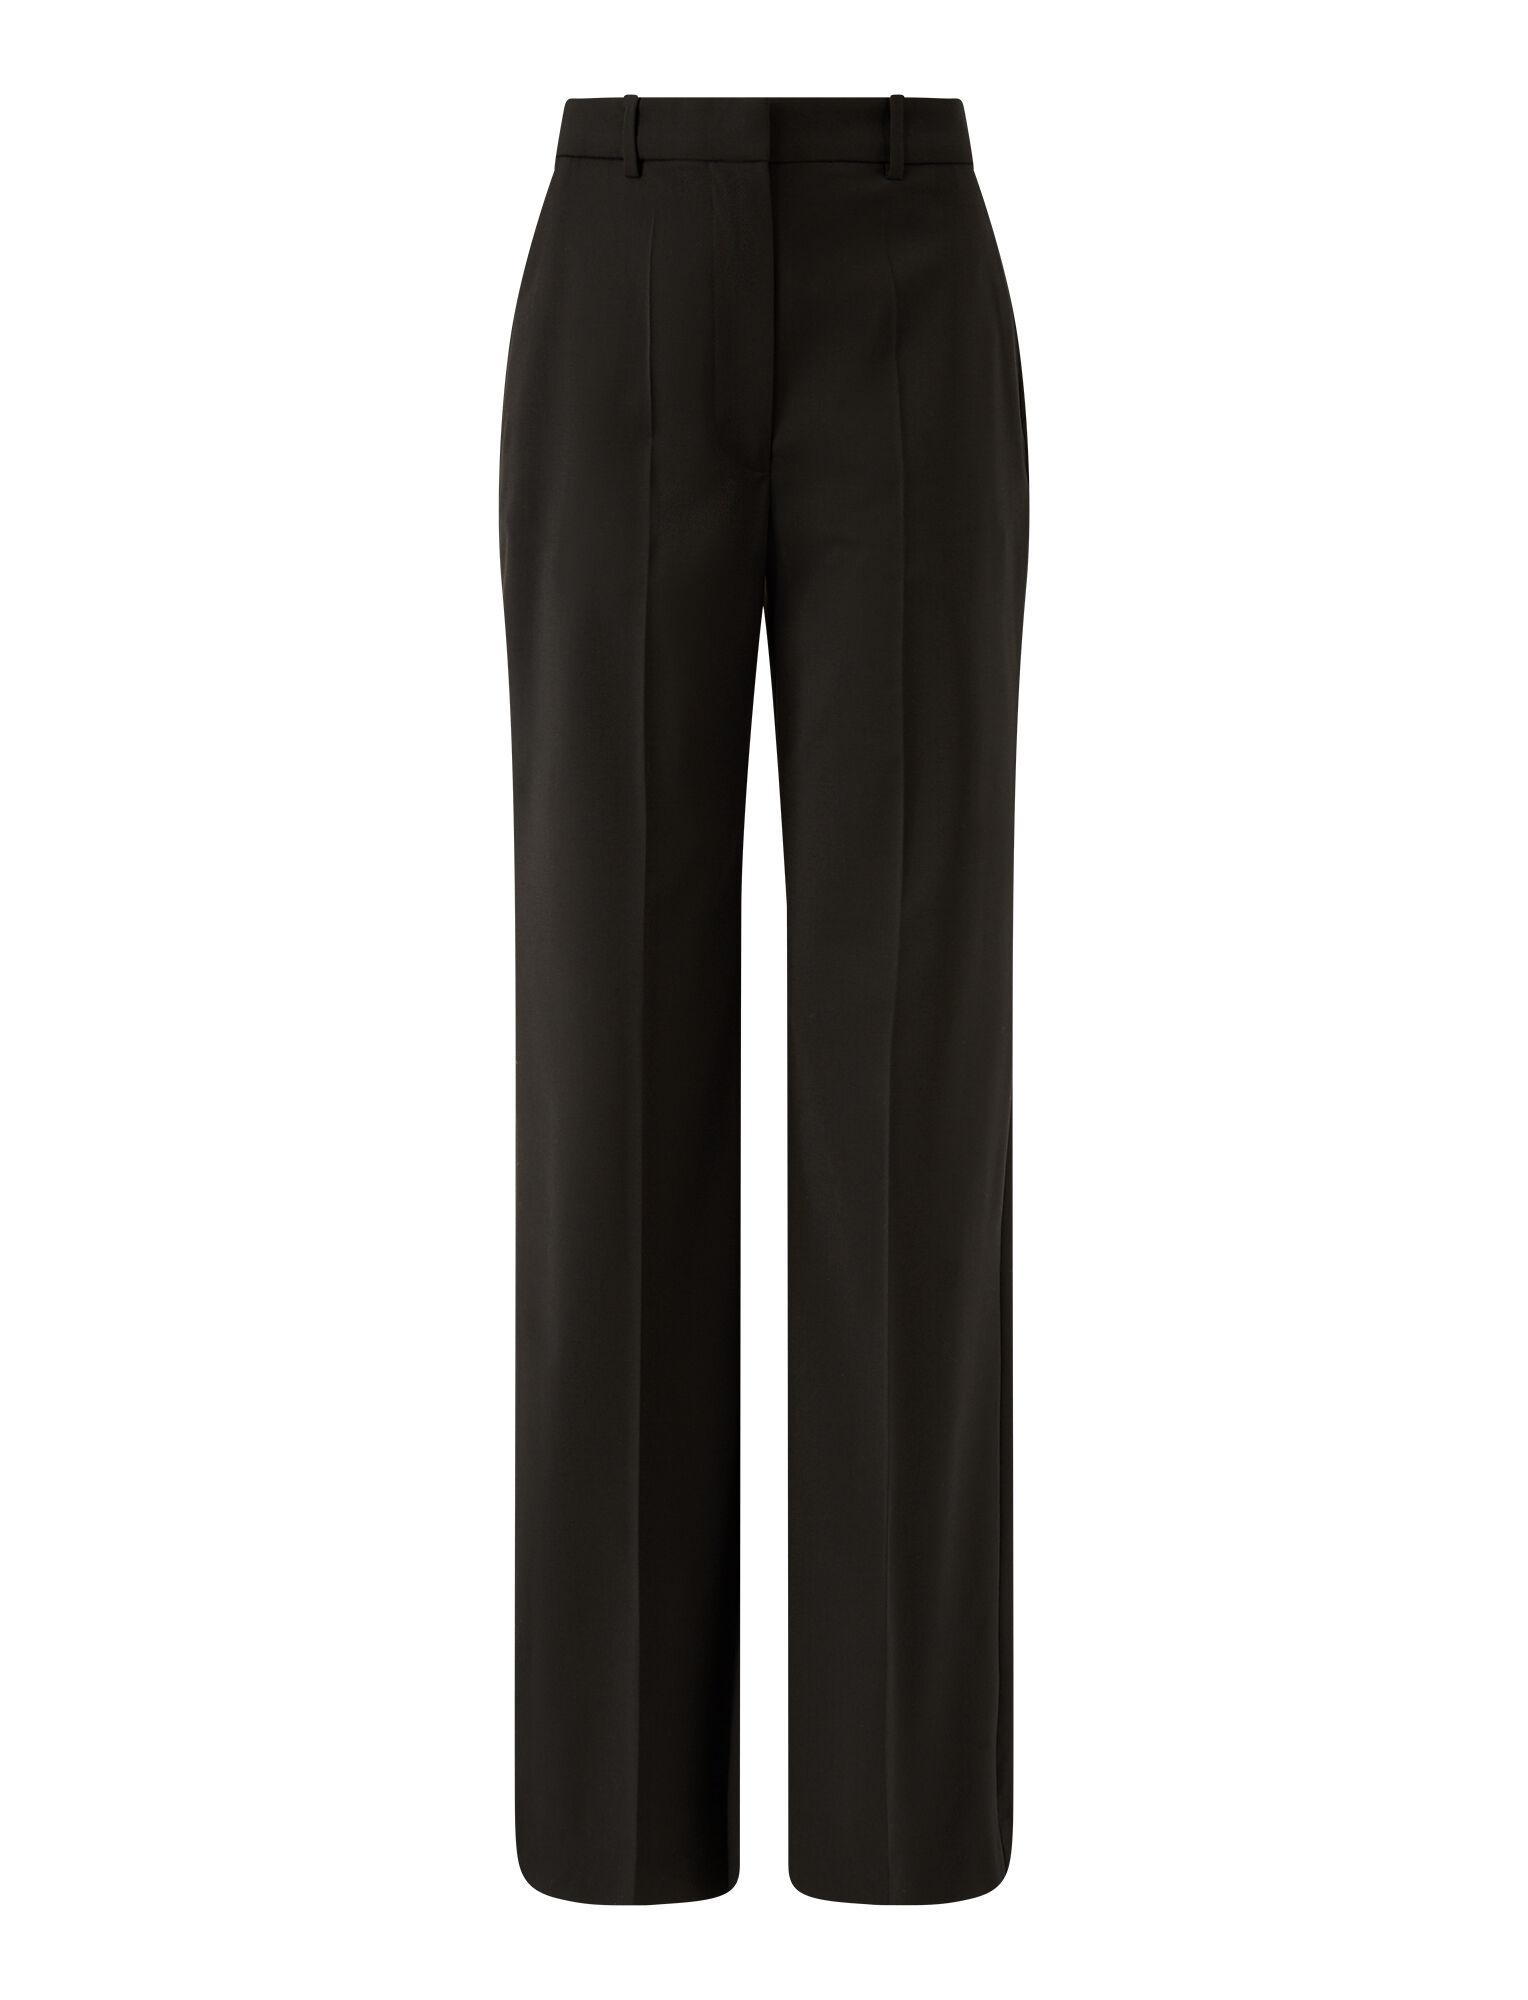 Joseph, Light Wool Suiting Morissey Trousers, in BLACK